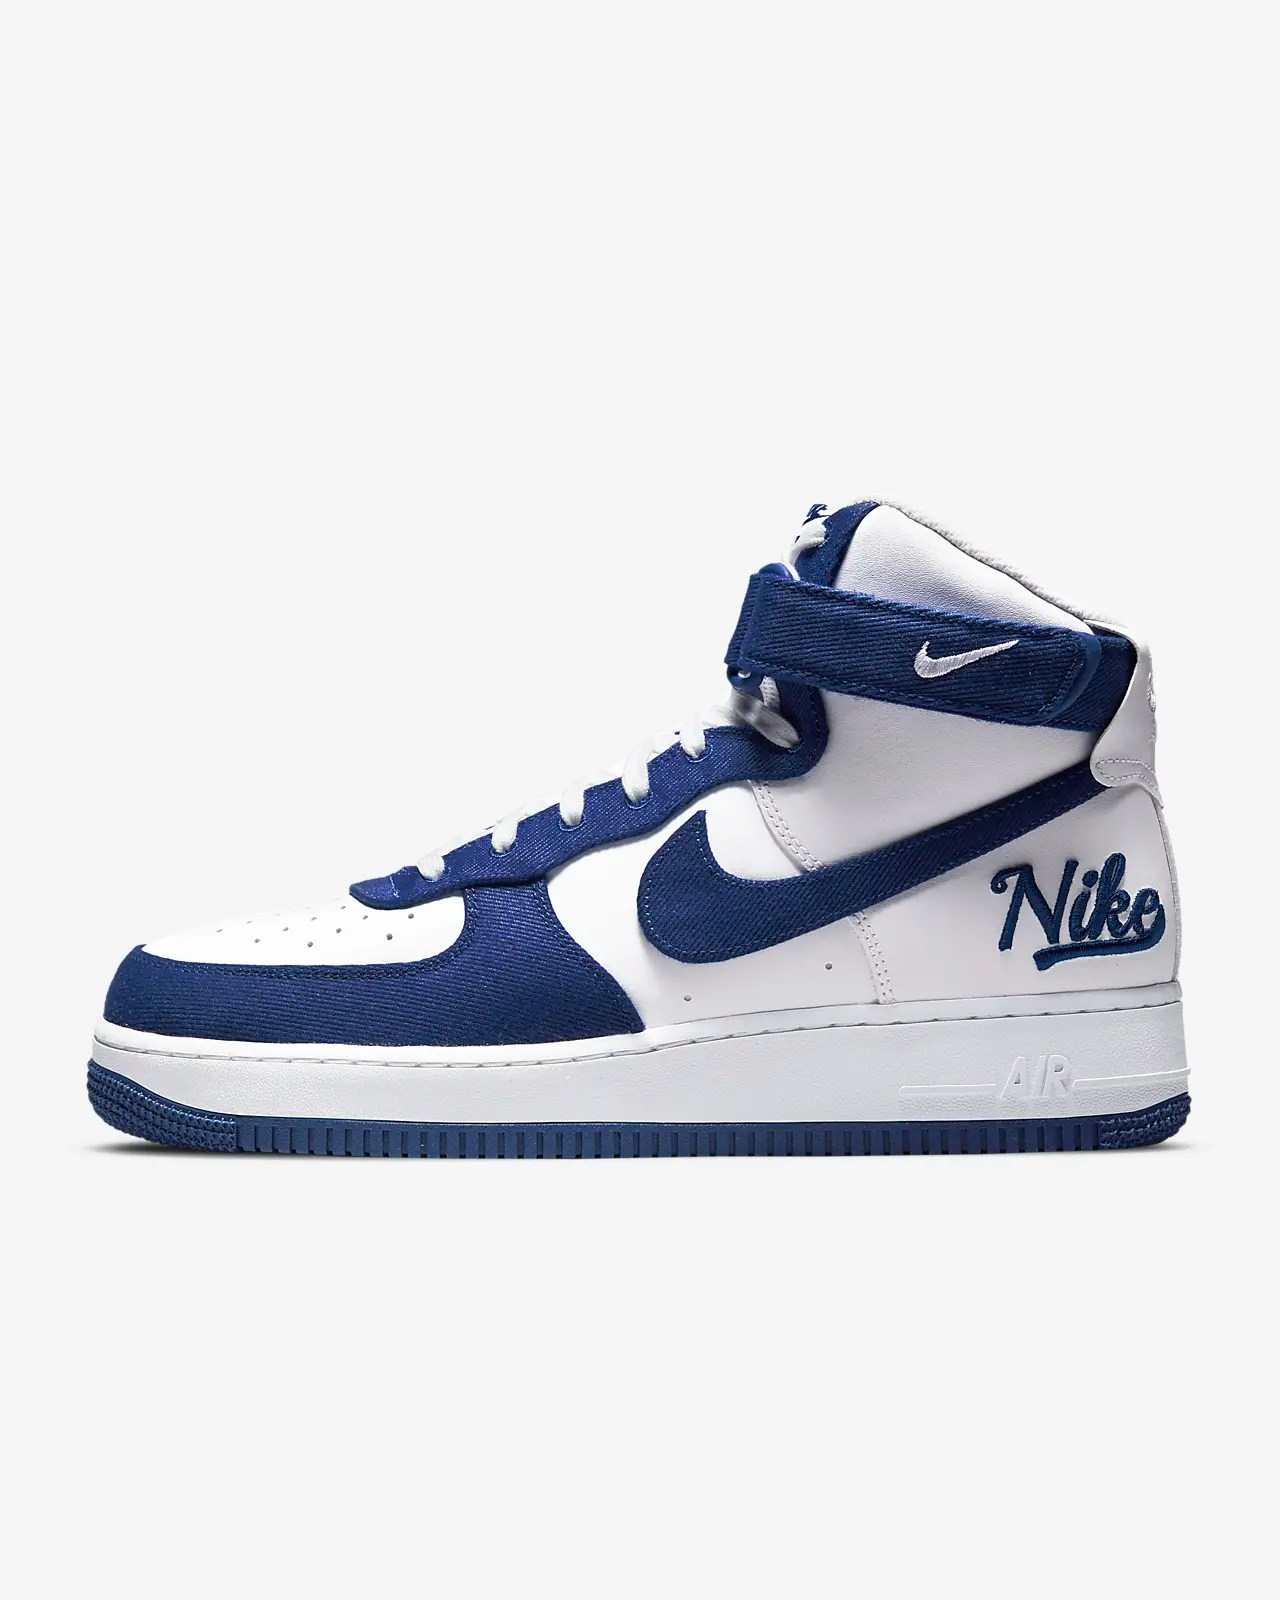 Nike Air Force 1 High '07 EMB Men's Shoe